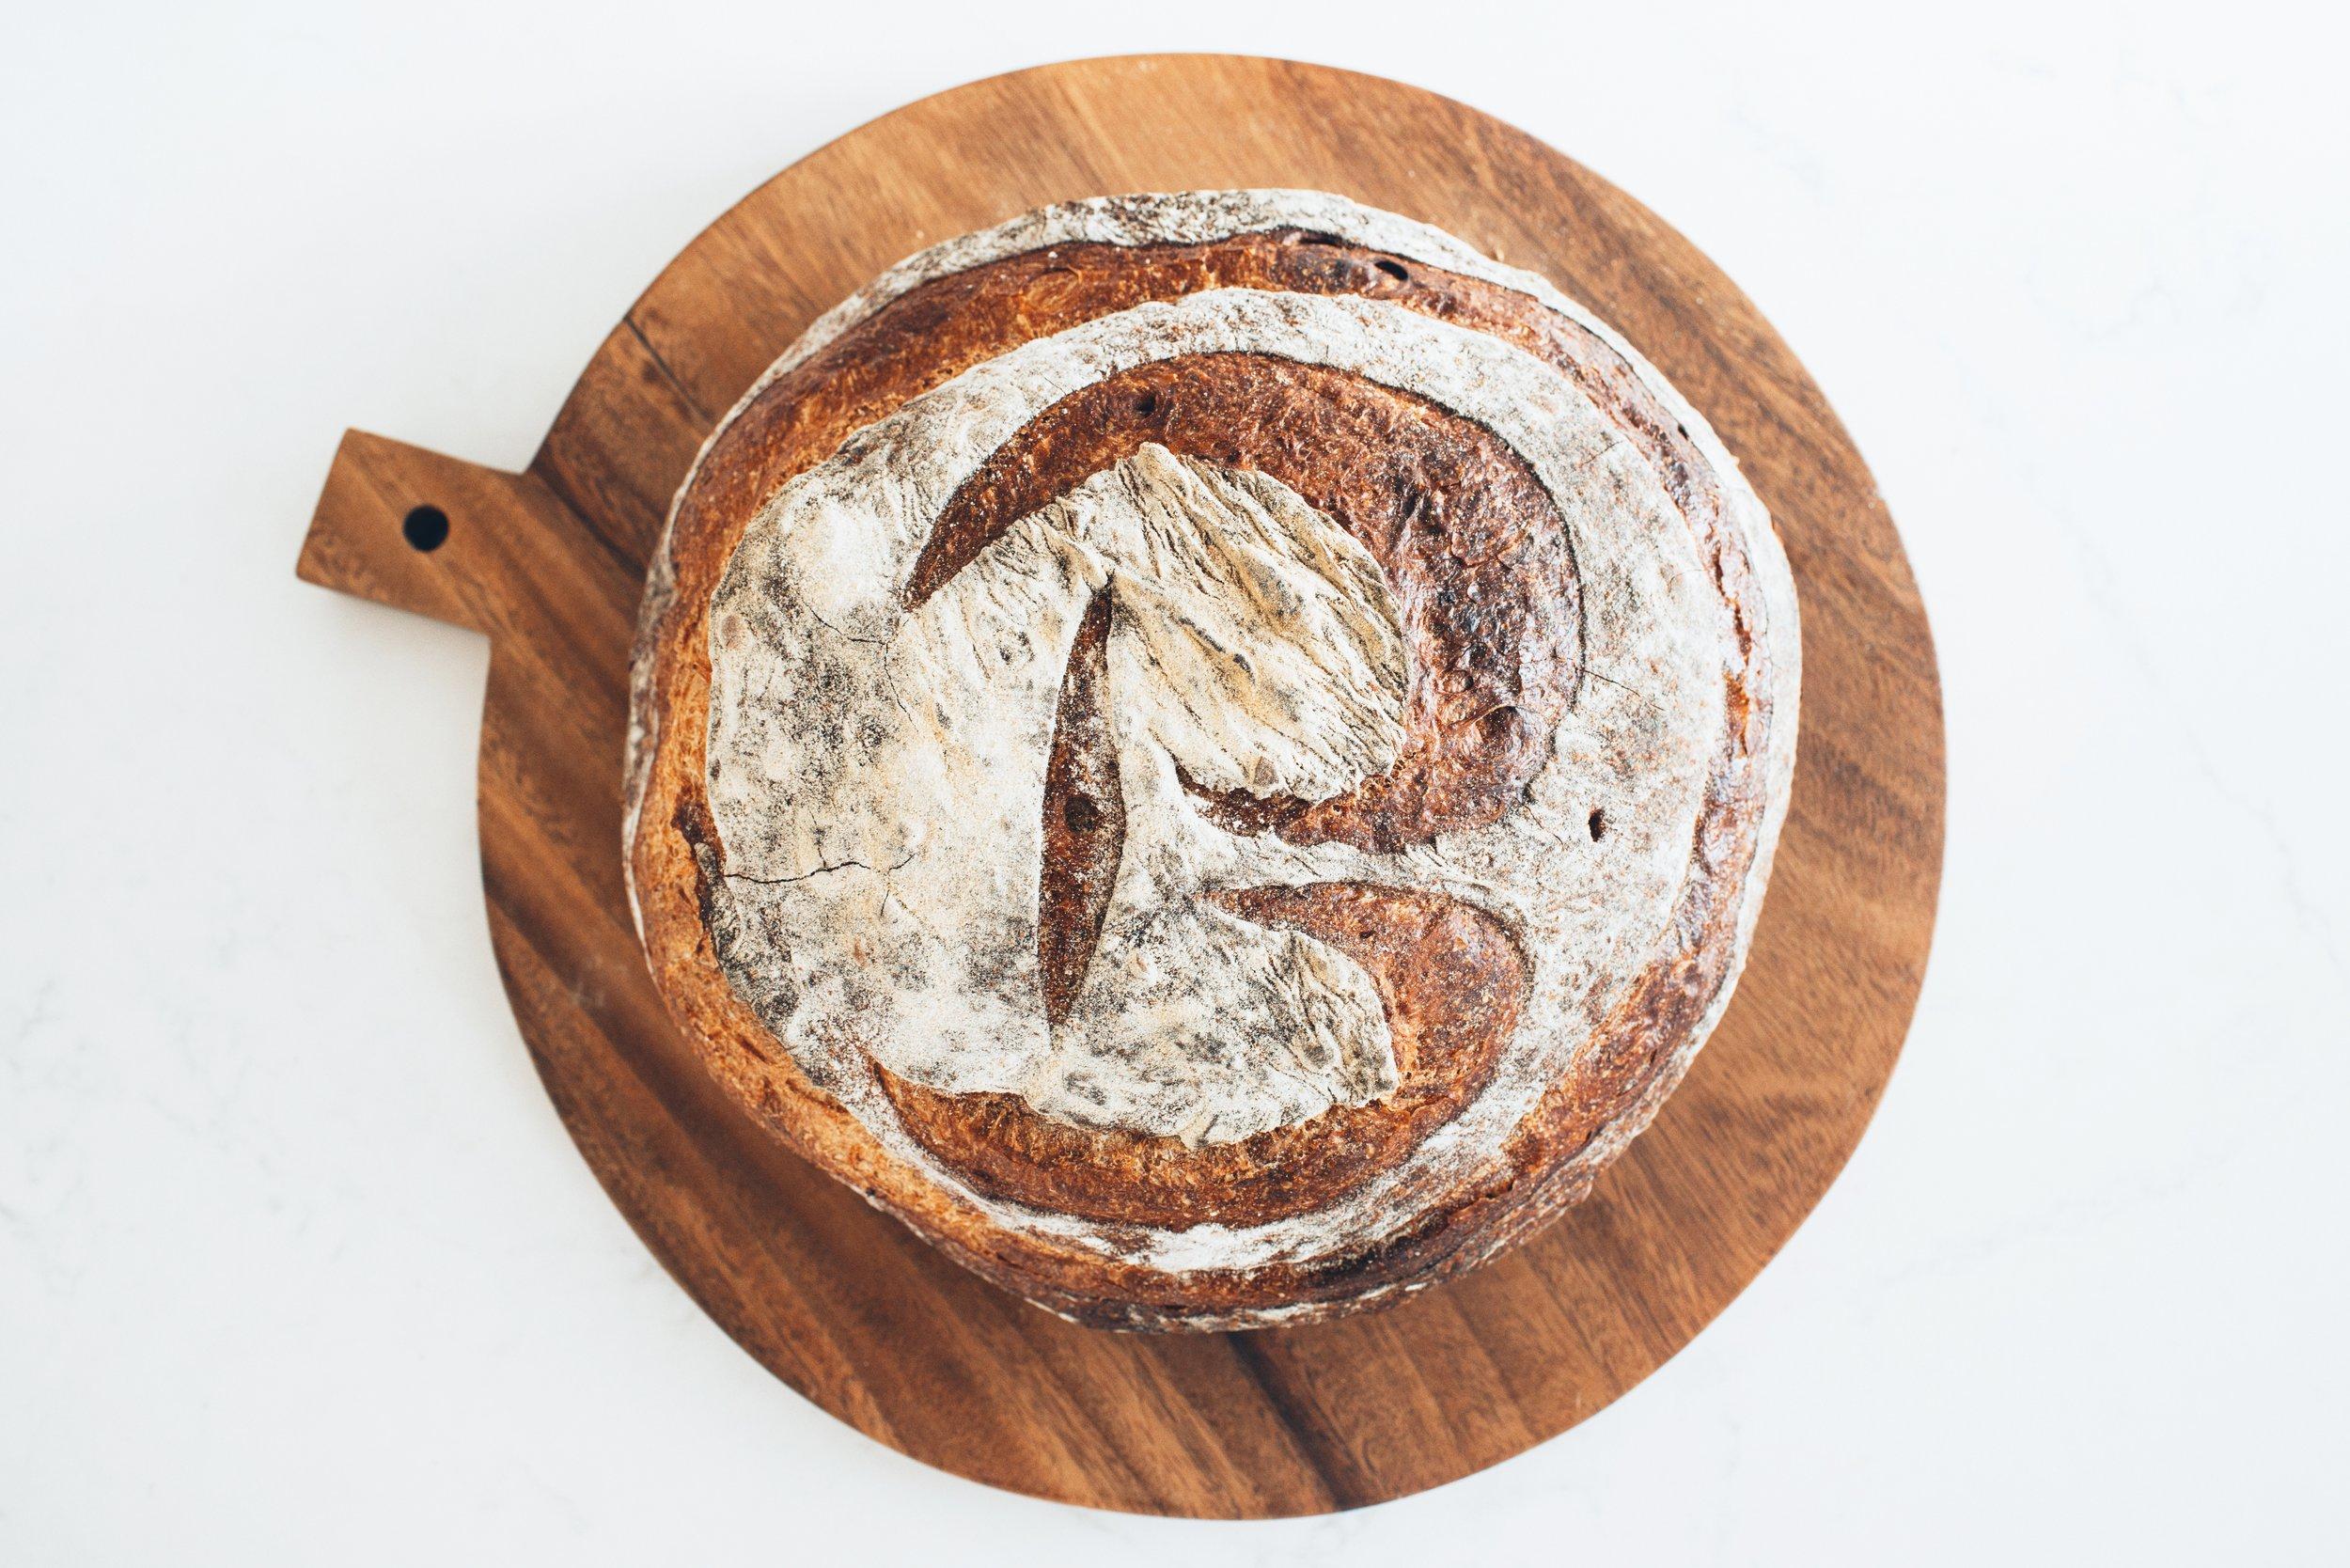 Bread_Artisan_Bakery_70_1.jpg